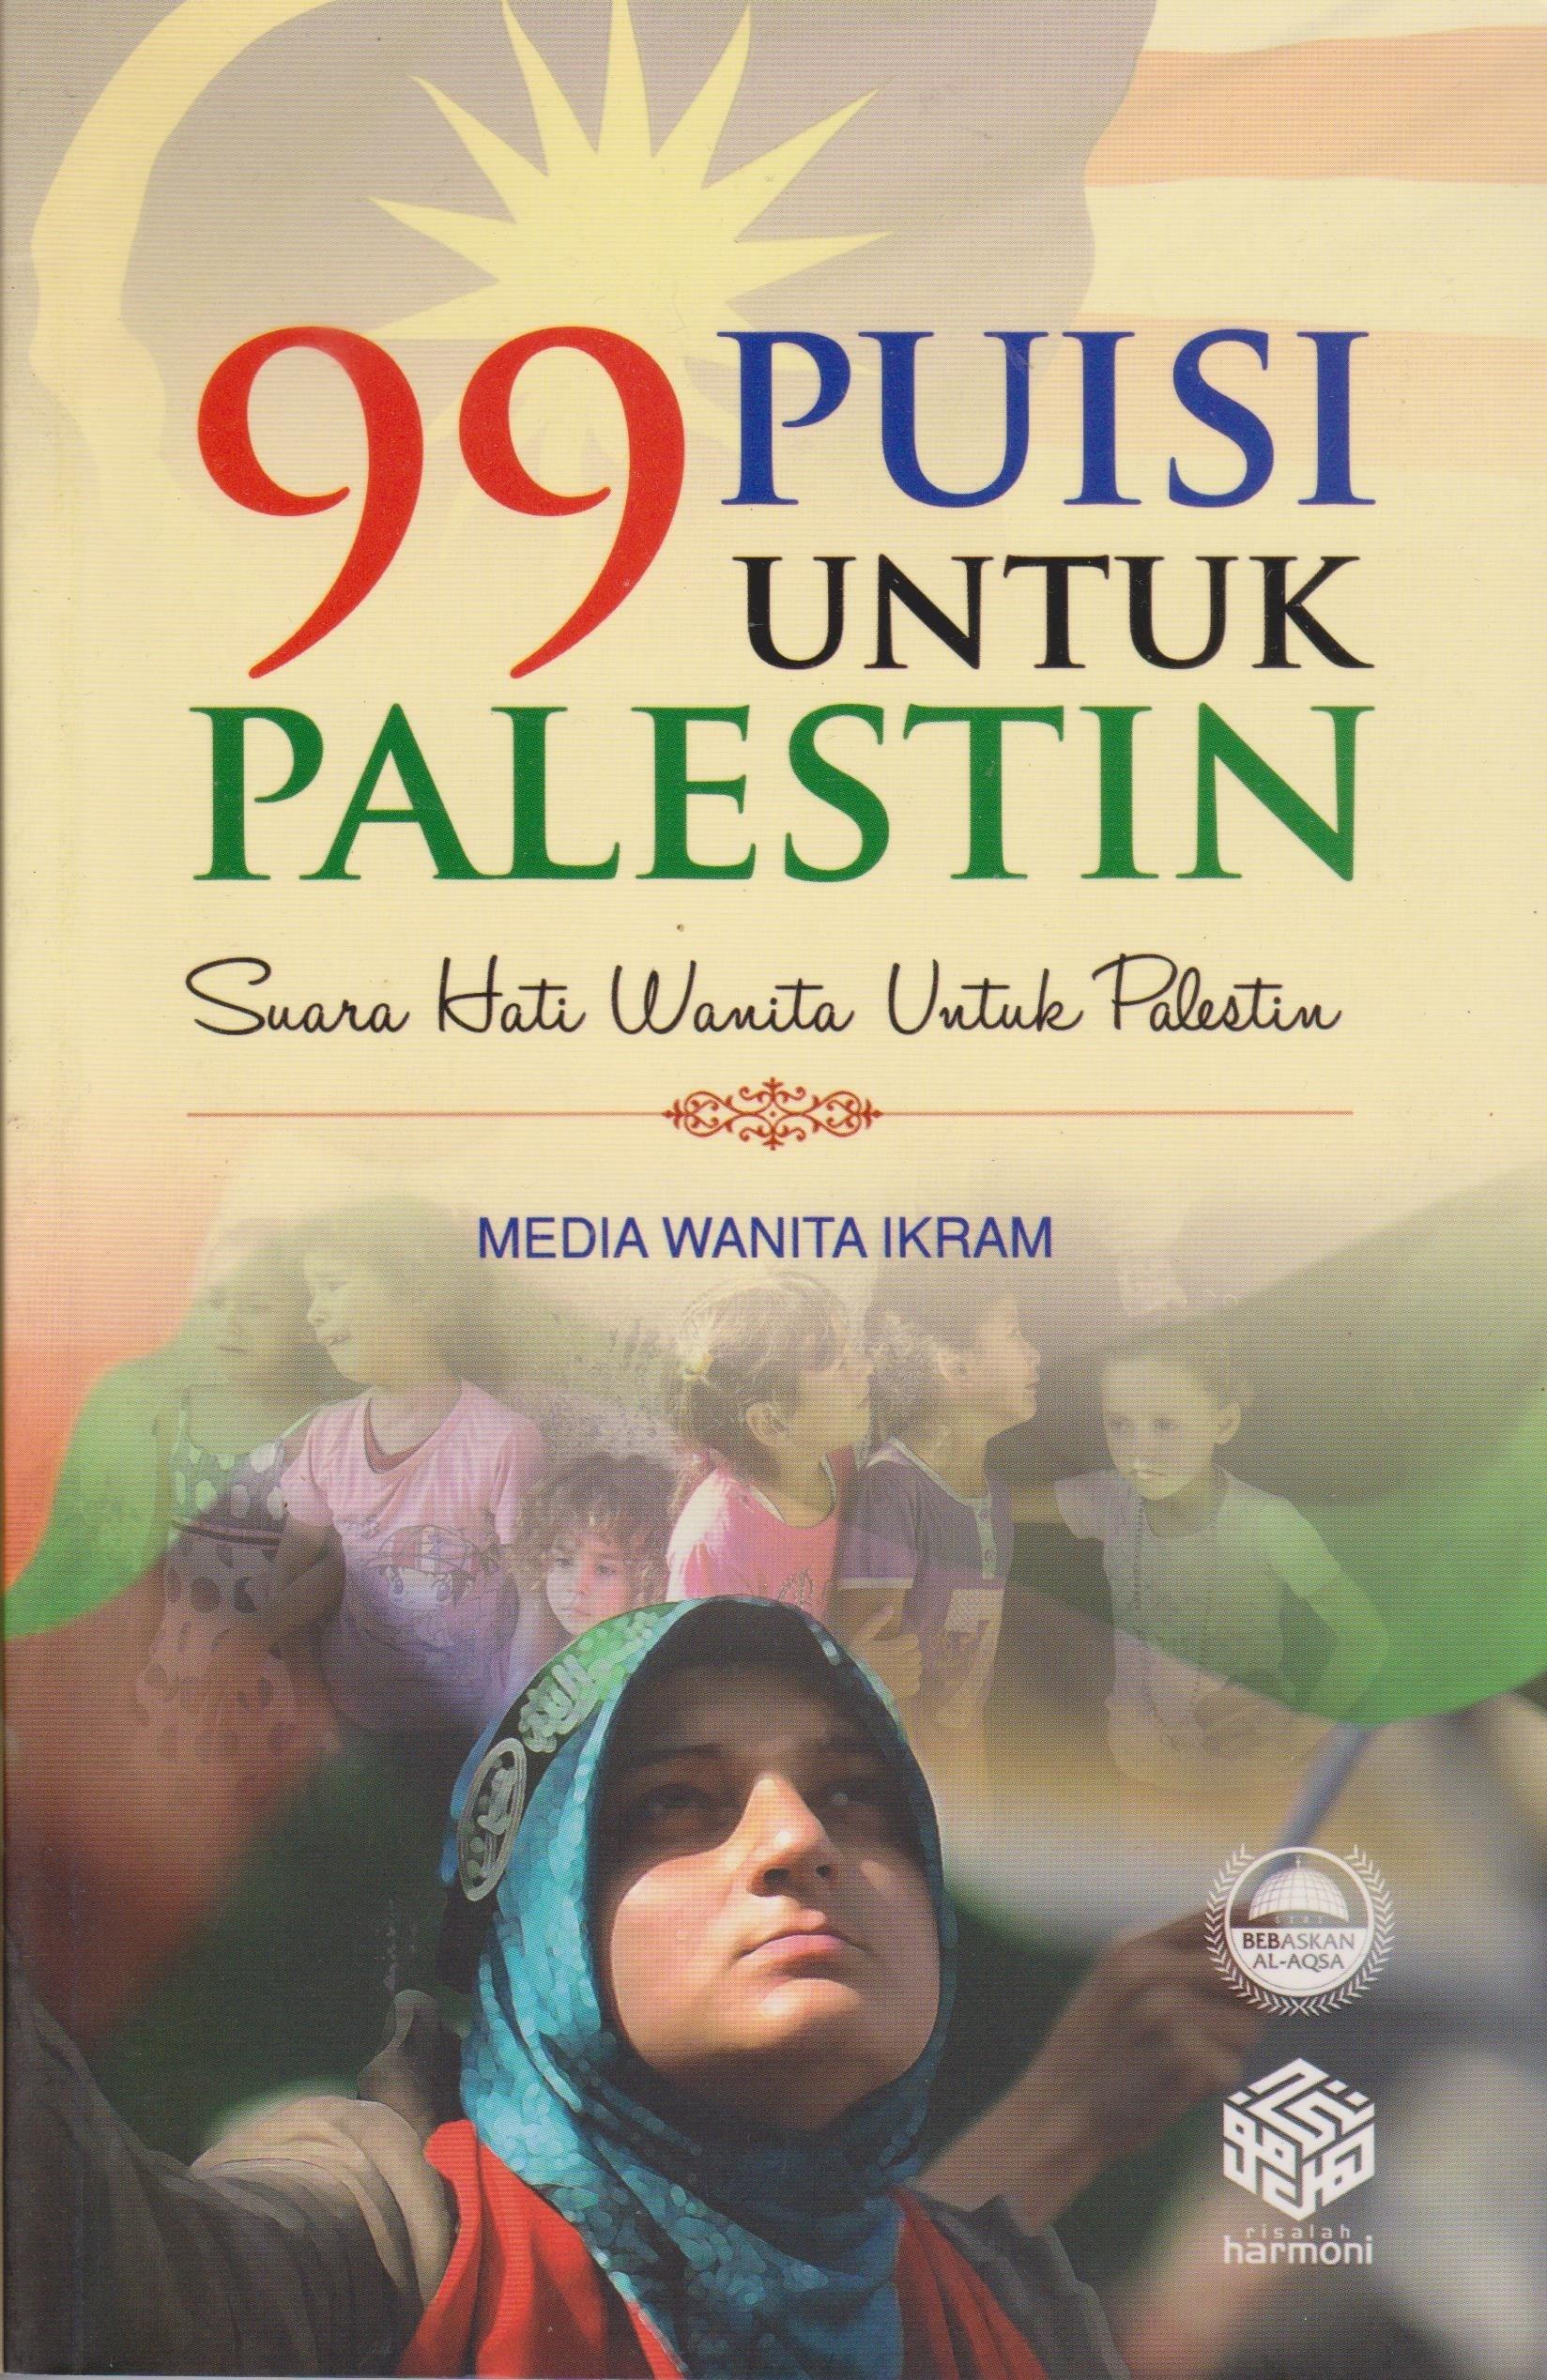 99 Puisi Untuk Palestin Hanom Taib